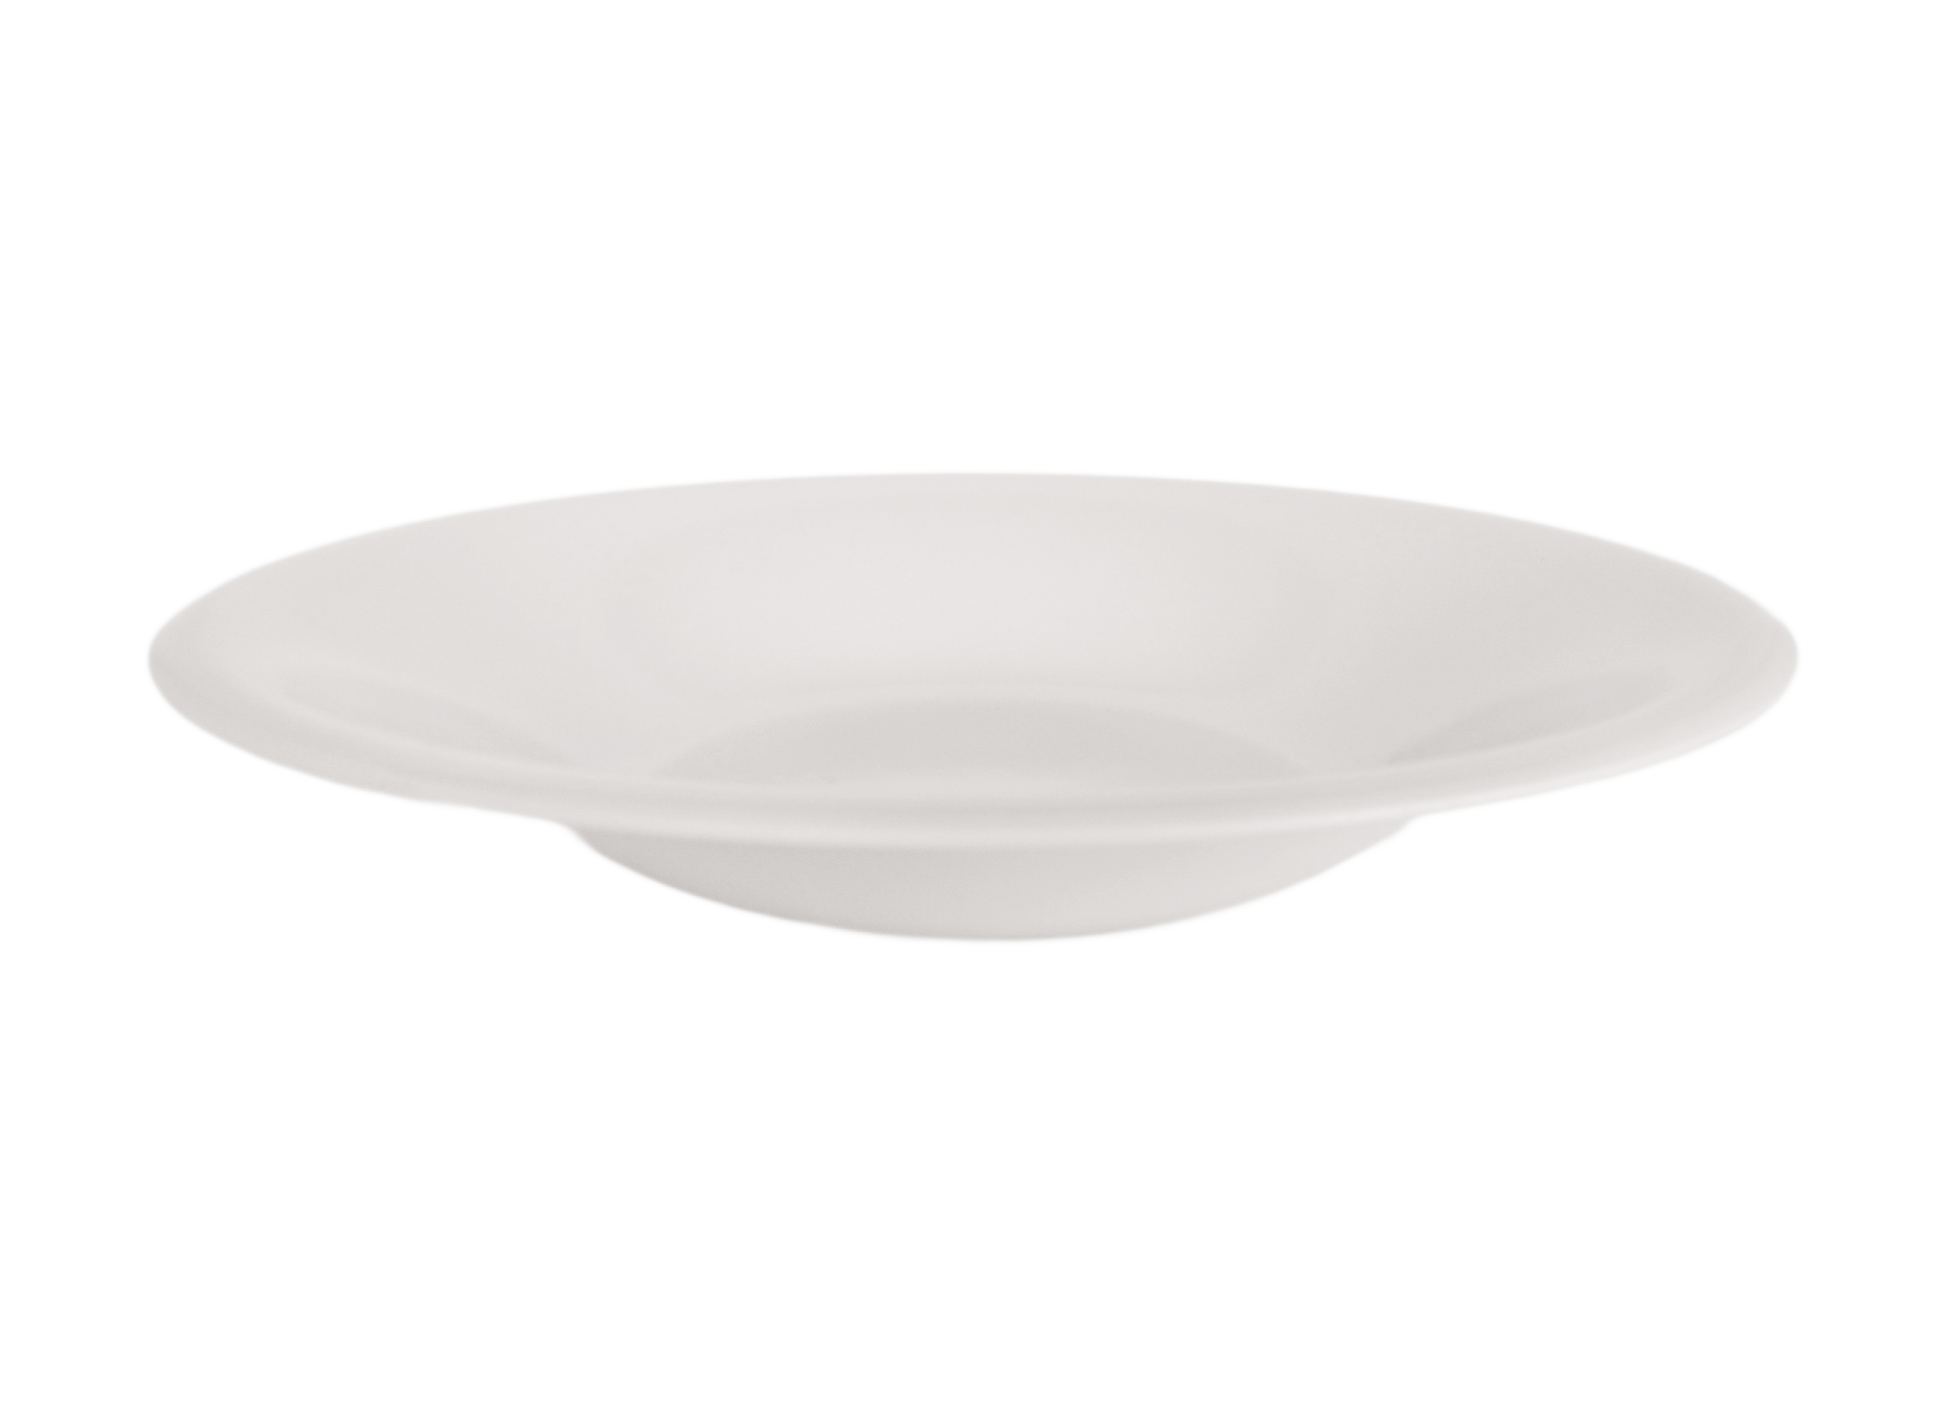 dsCCAC metal dish cream.png